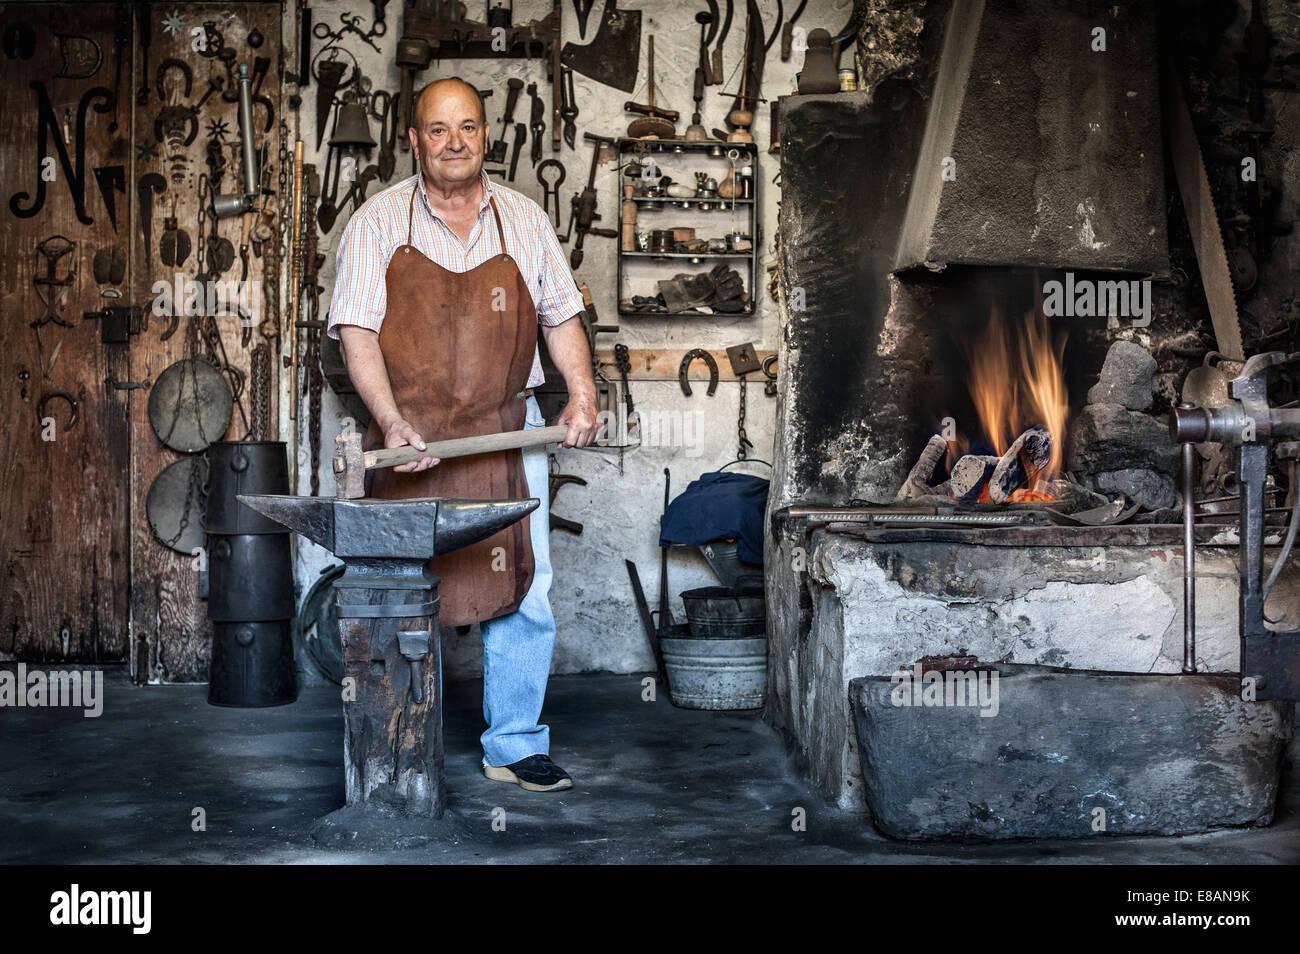 Retrato de senior masculino en herrería taller tradicional, Cagliari, Cerdeña, Italia Imagen De Stock